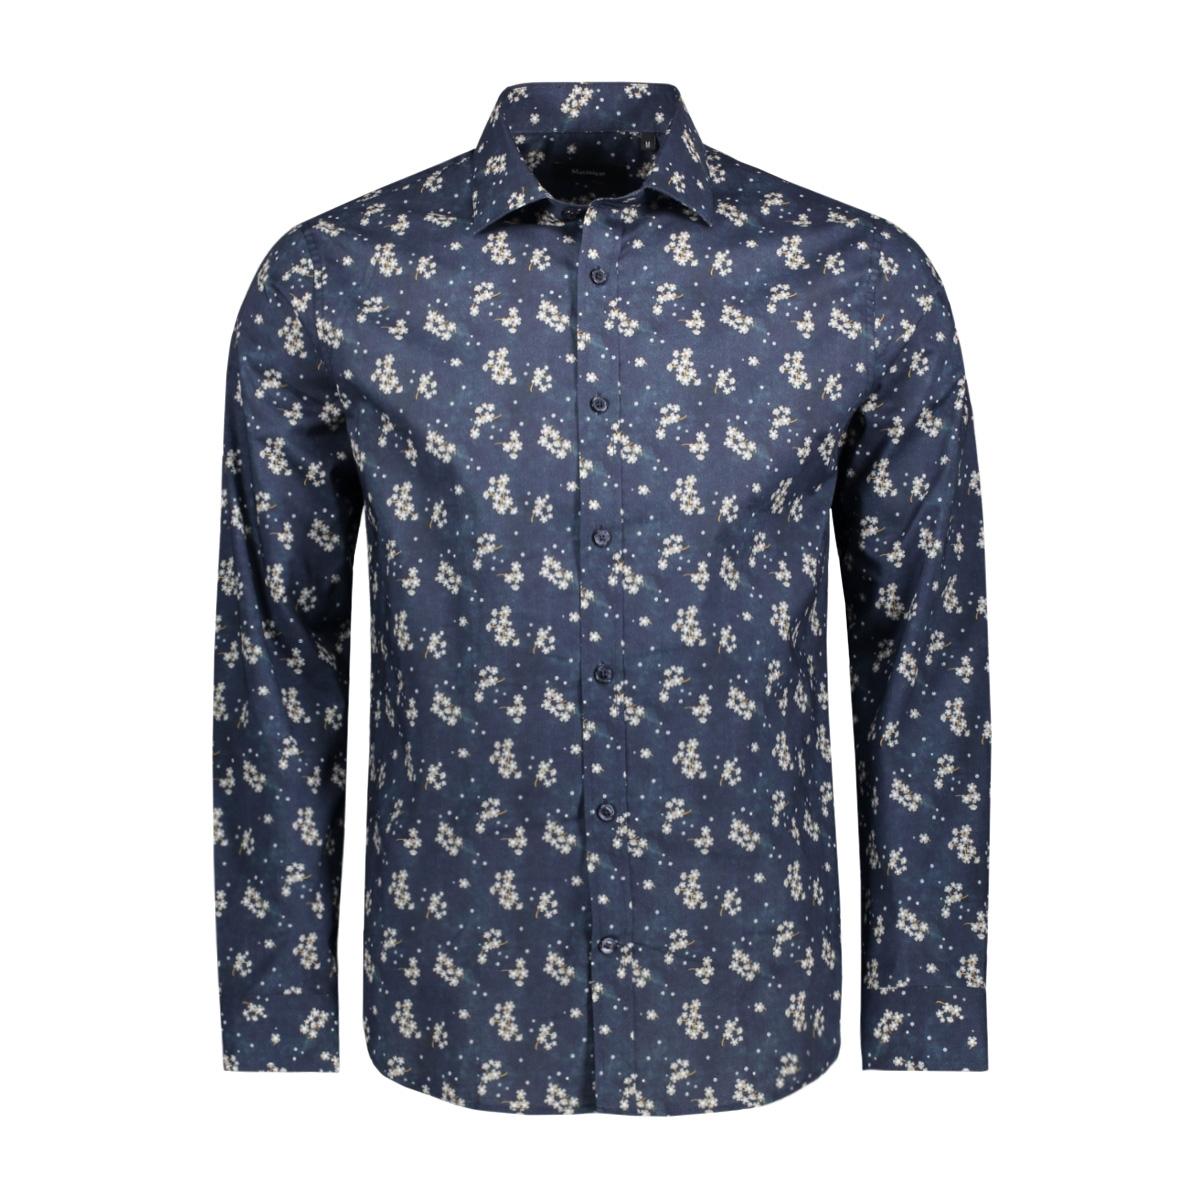 30203088 matinique overhemd 20215